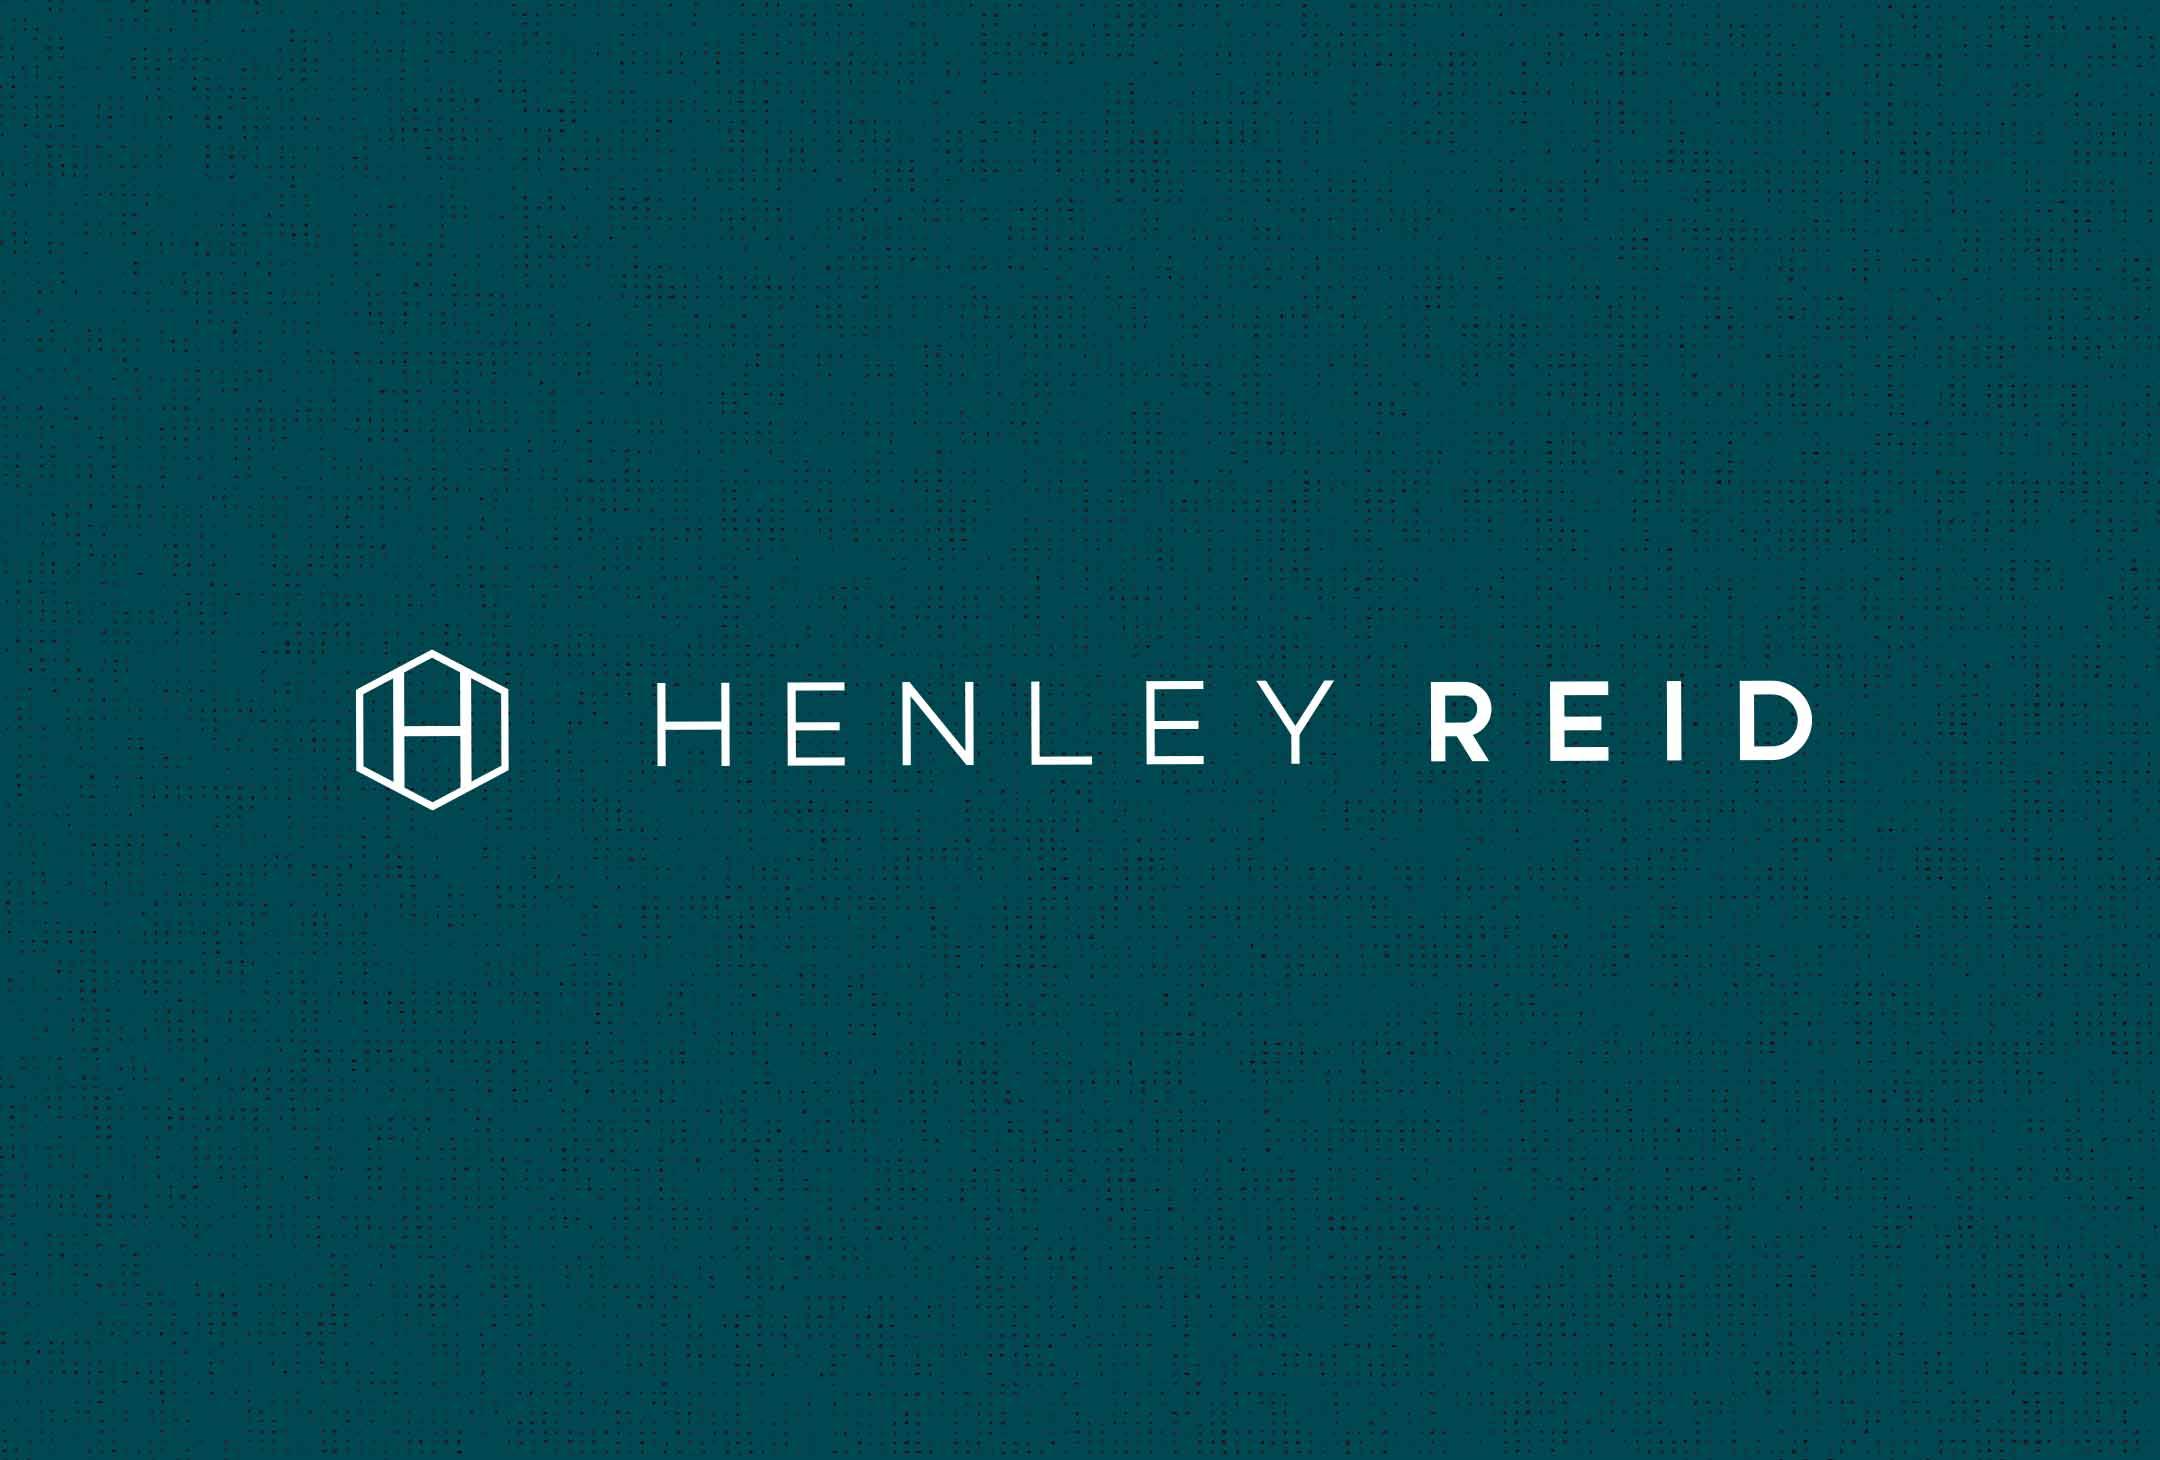 Henley Reid logo